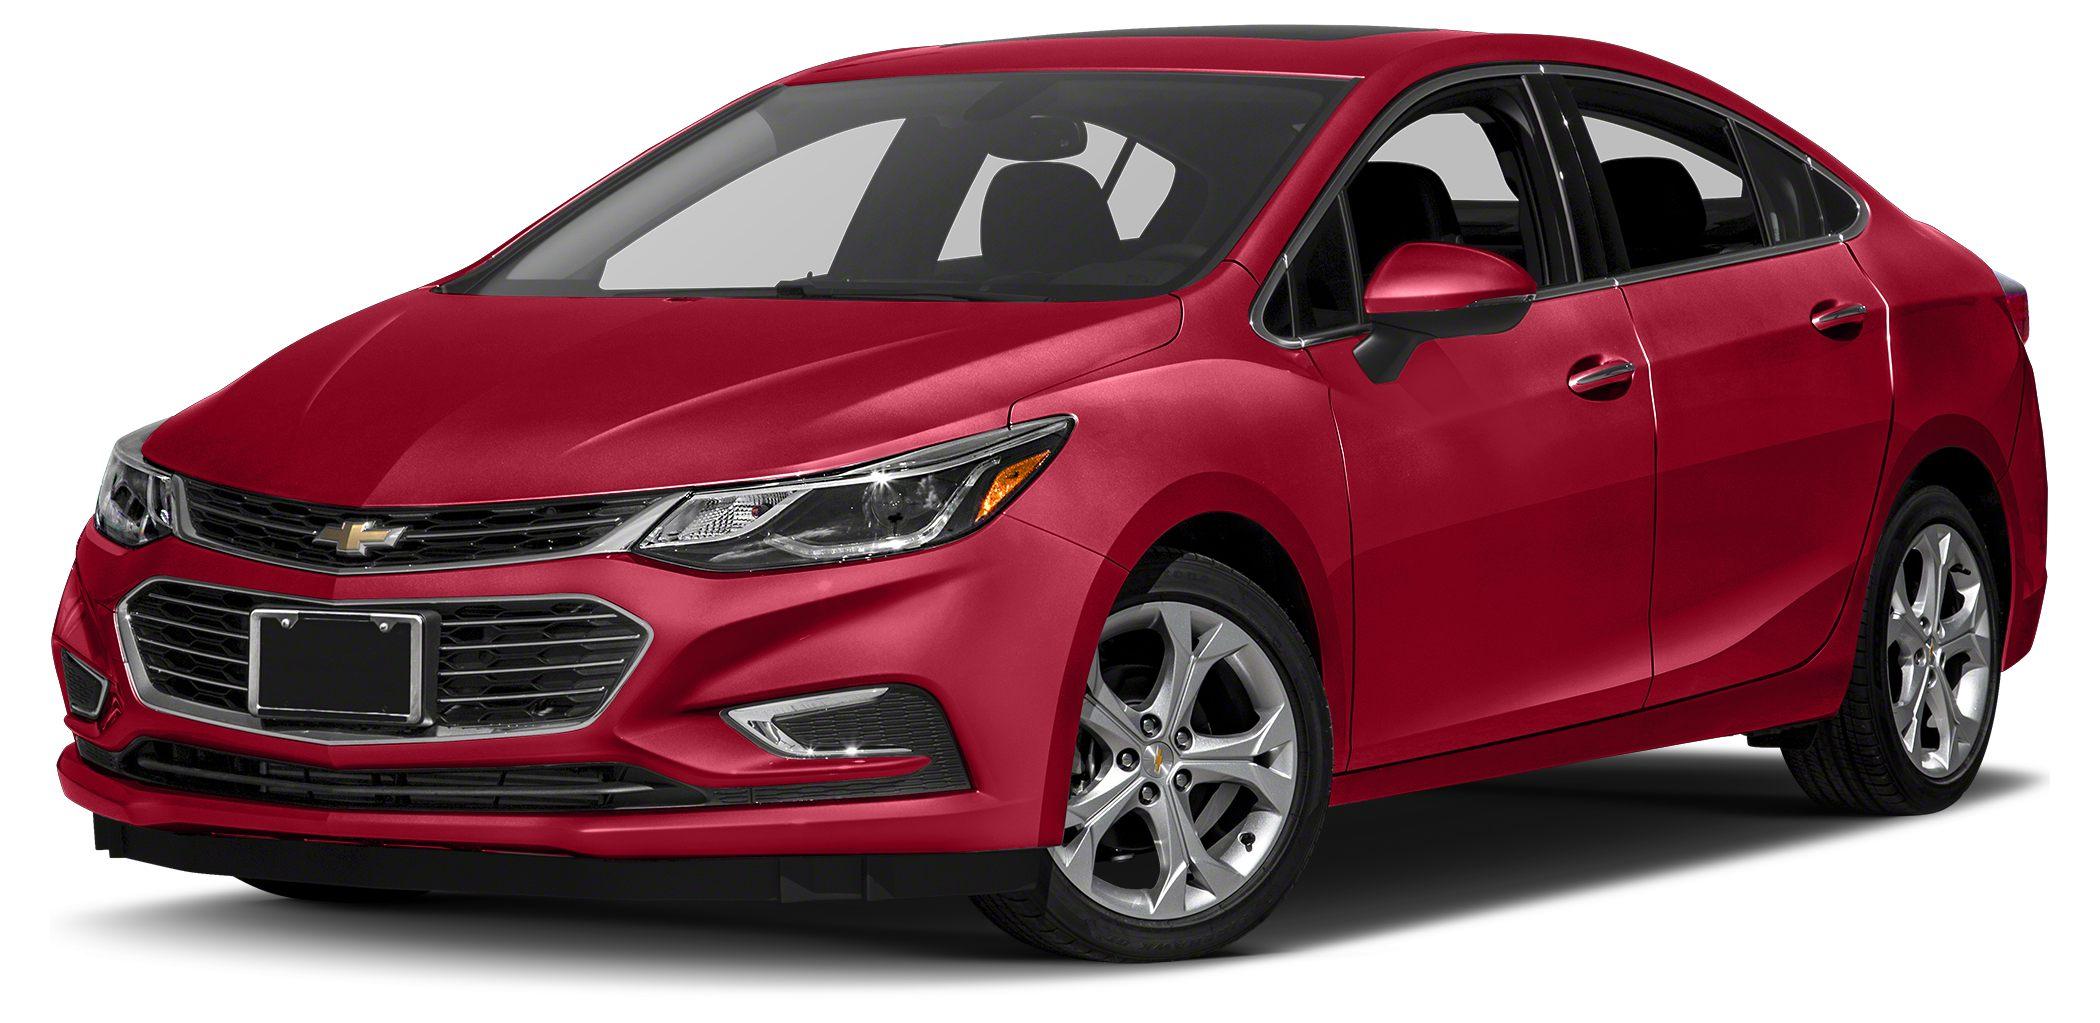 2016 Chevrolet Cruze LS LS trim RED HOT exterior and JET BLACK interior iPodMP3 Input Onboard